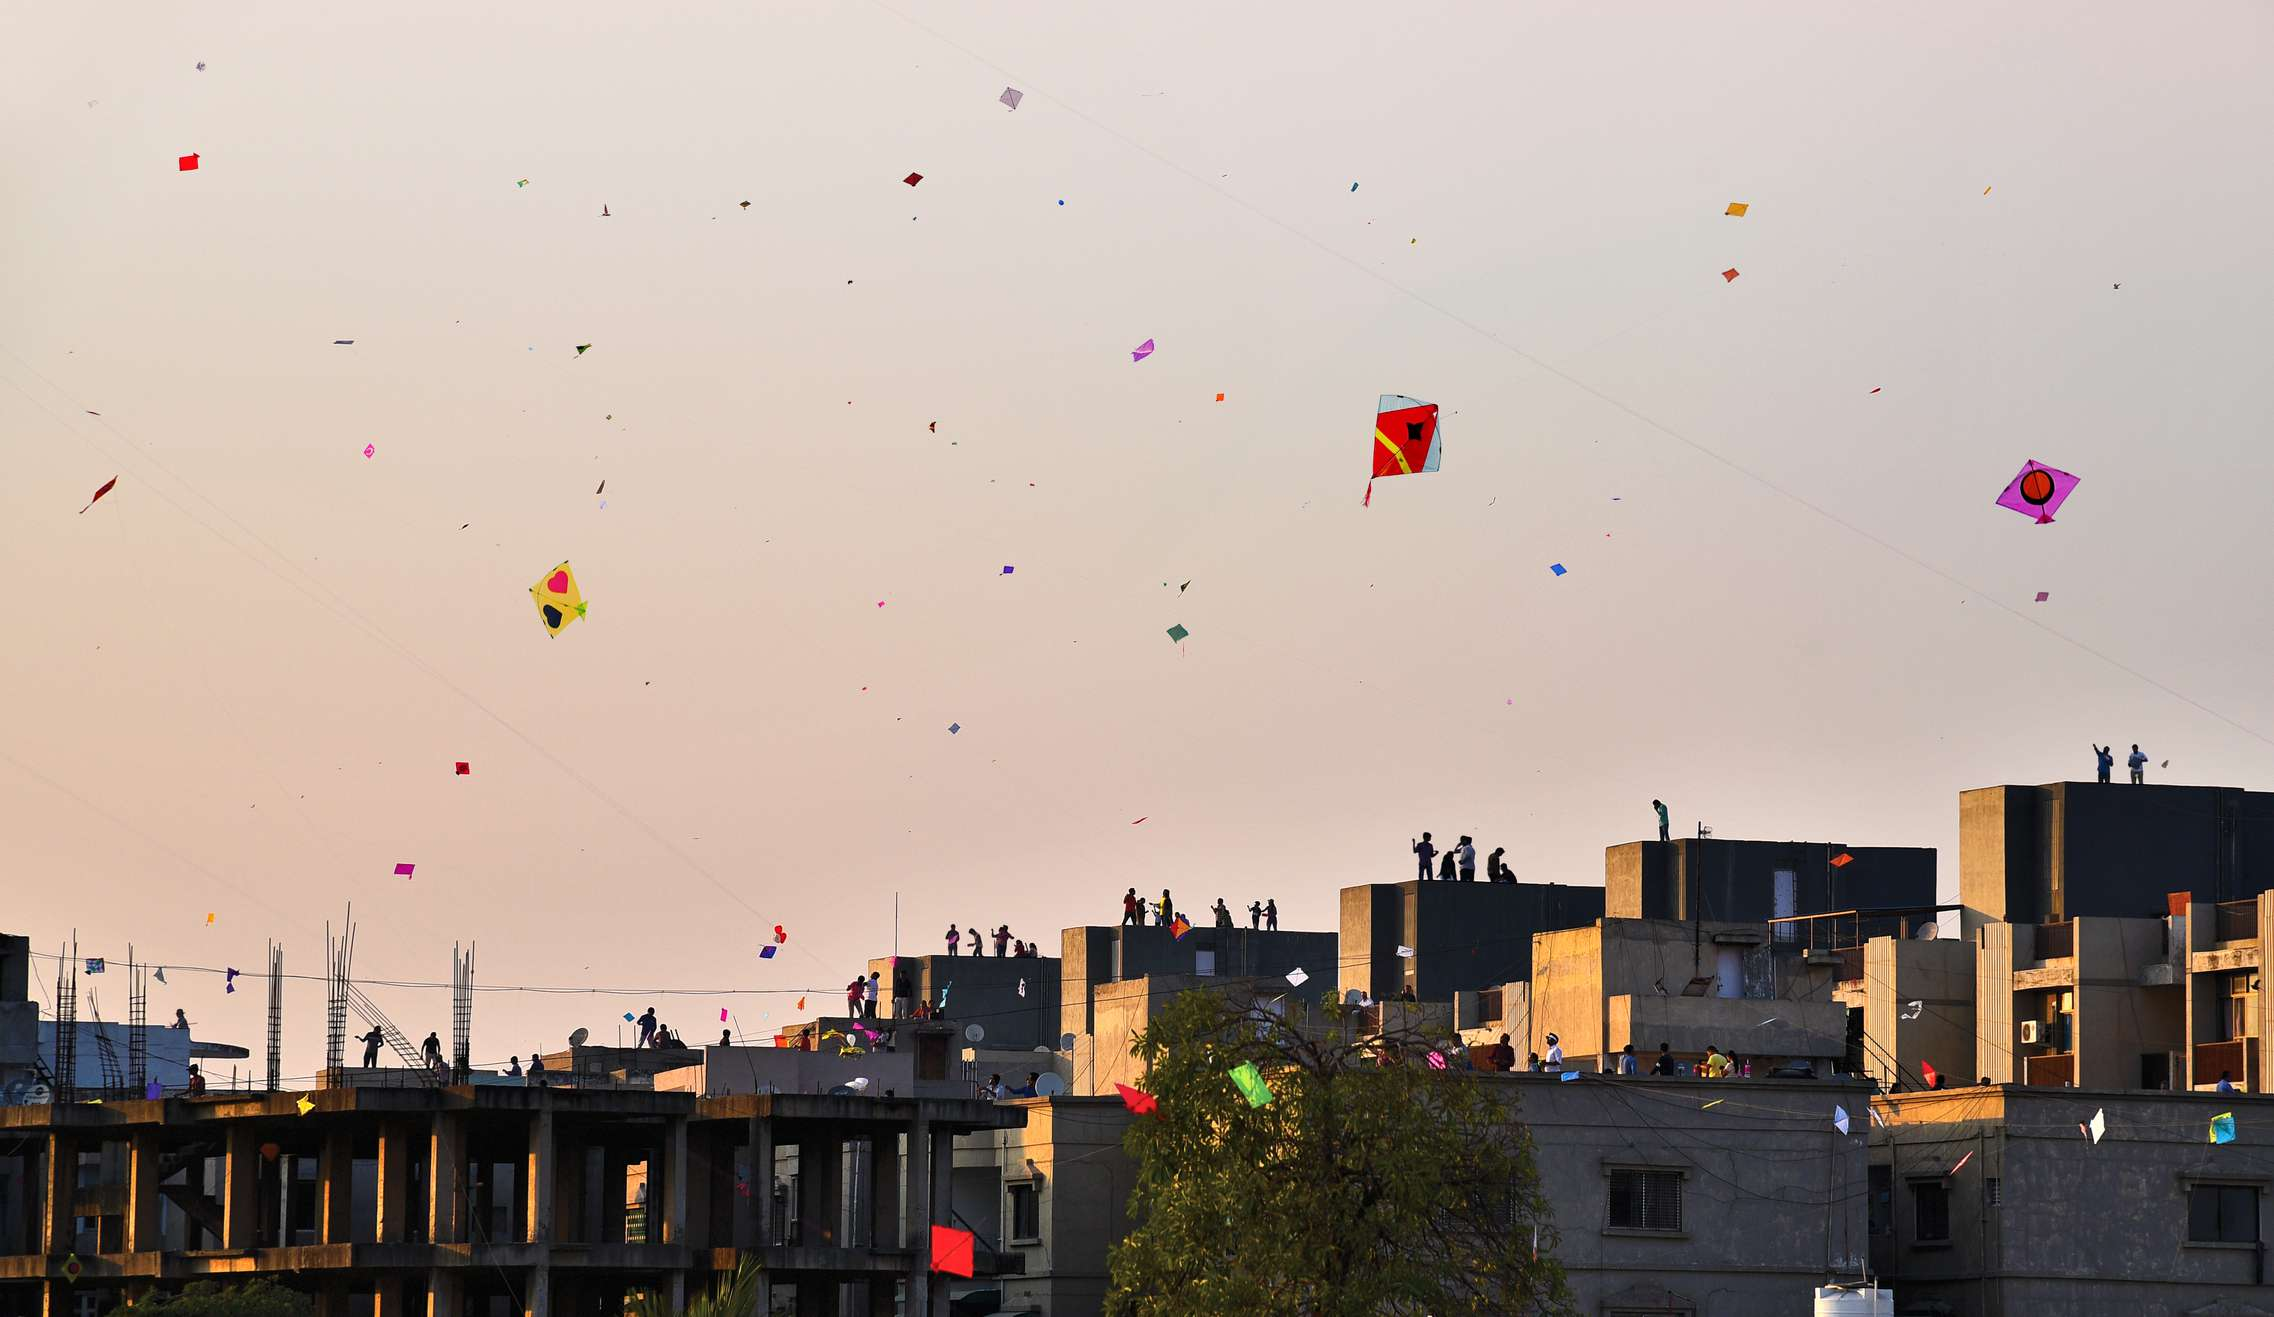 People enjoying Kite flying on Uttrayan (Makar Sankranti), Ahmedabad, Gujarat, India